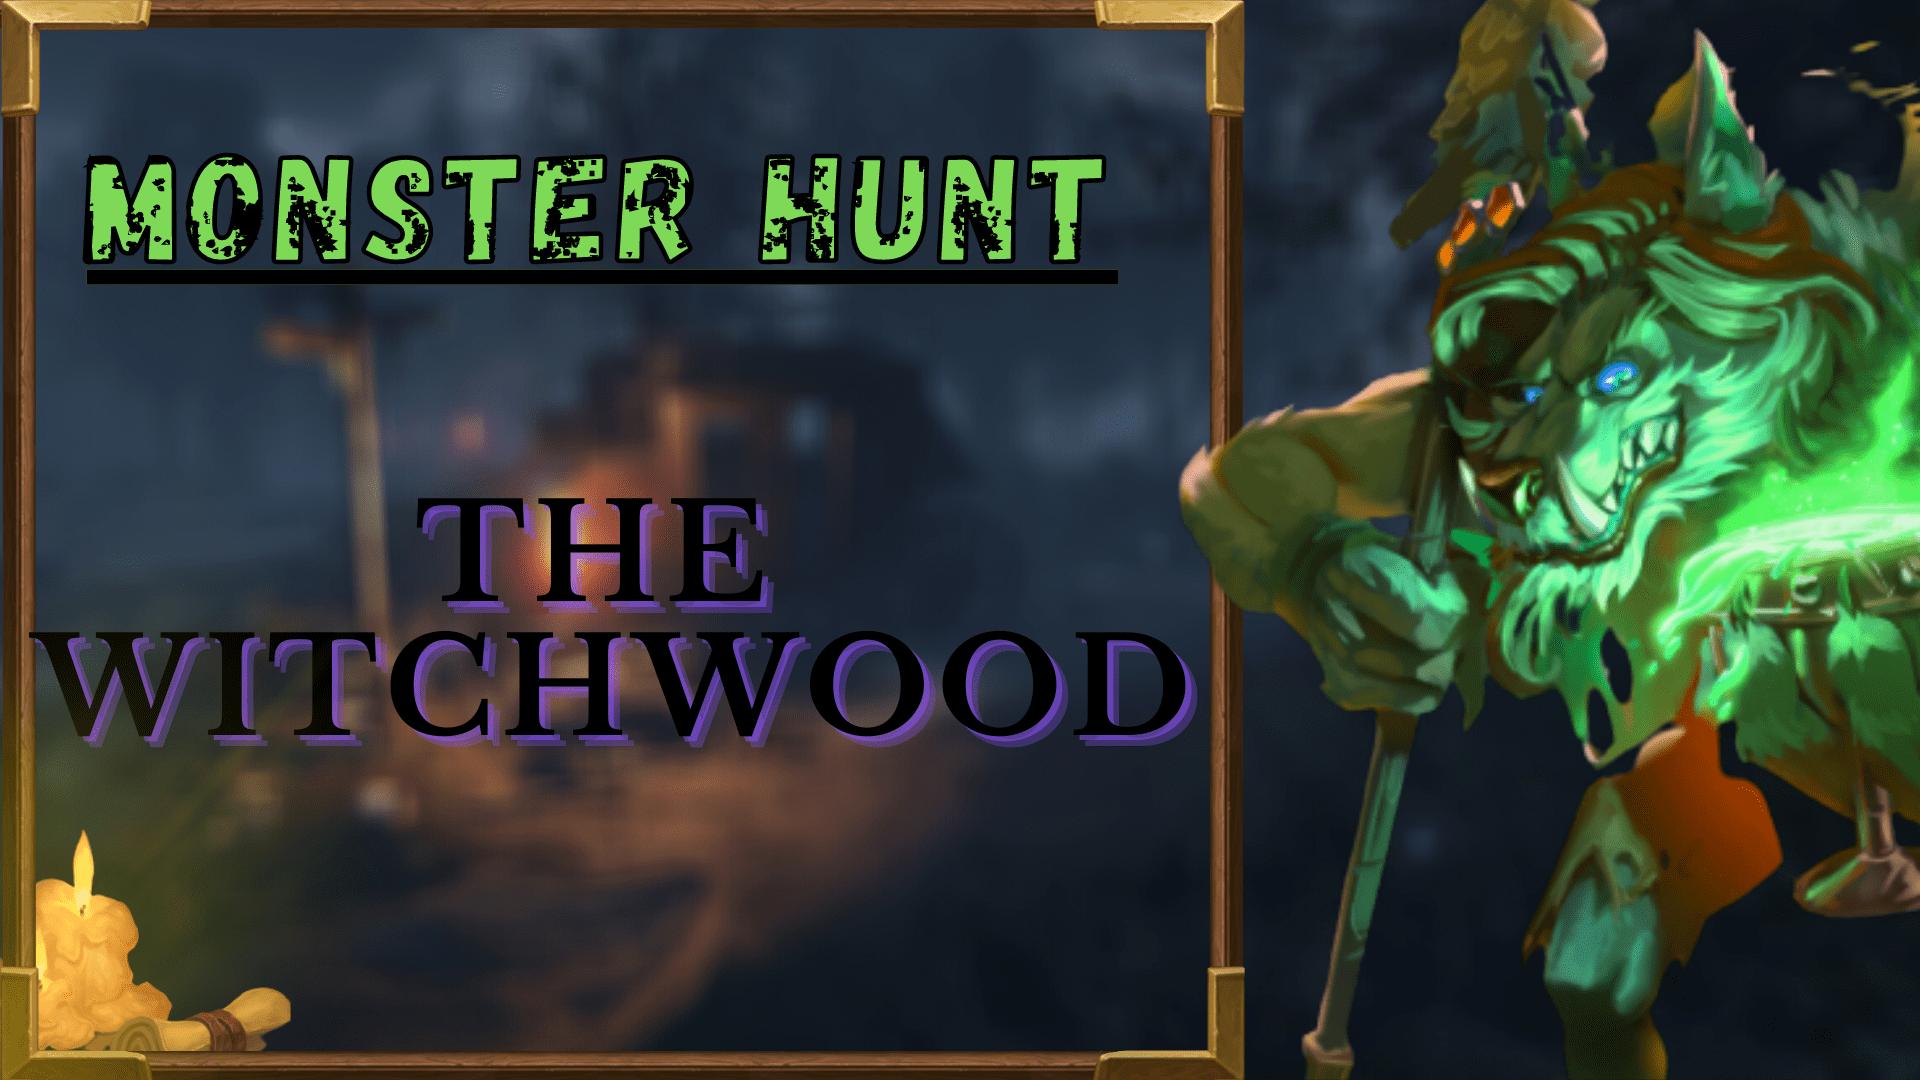 Monster hunt: The WitchWooD Zafari - e2p.com